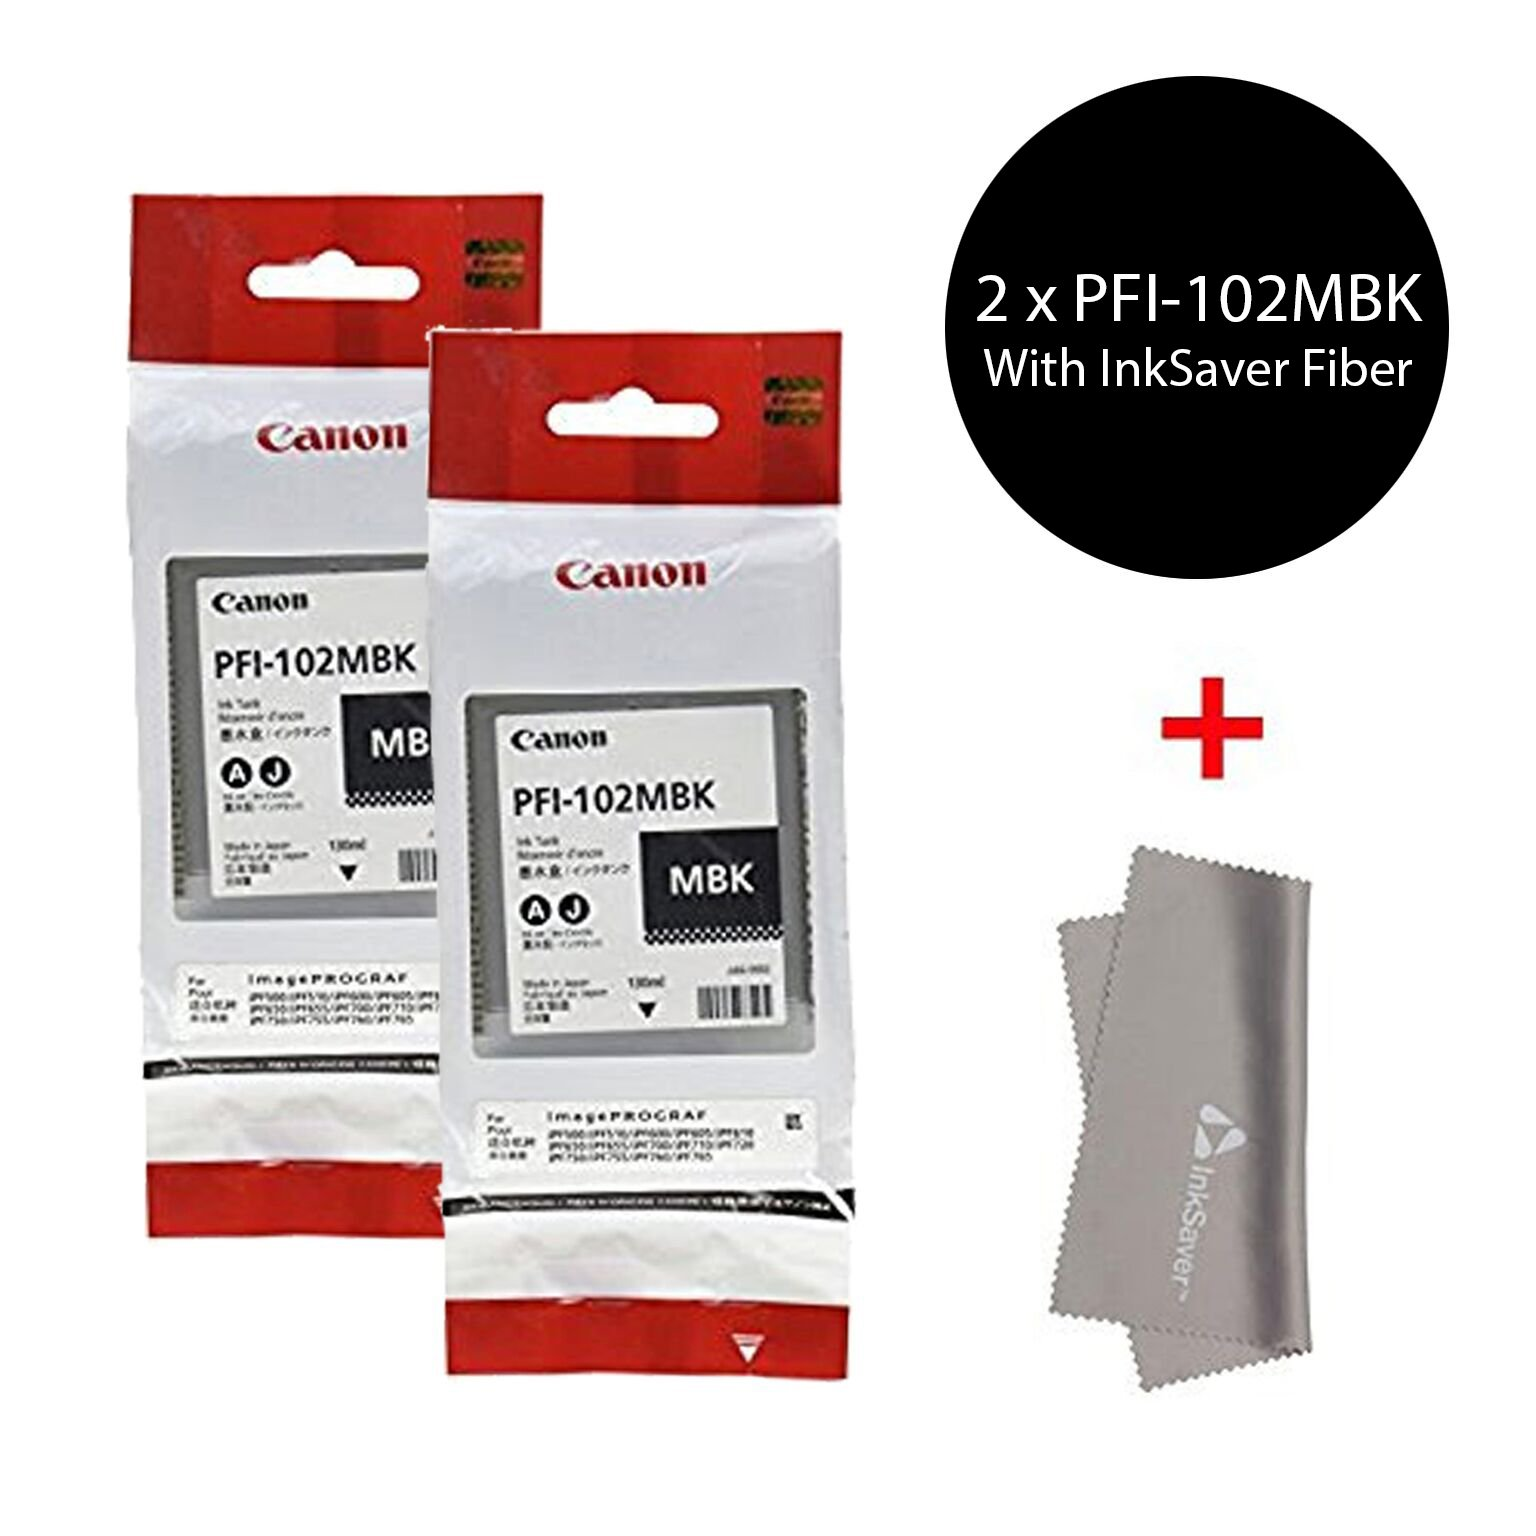 Original Canon 2 x PFI-102MBK Pigment Matte Black Ink Tank for the imagePROGRAF iPF500/600/700 Inkjet Printers, 130 ml.+ InkSAVER MicroFiber LCD Screen Cleaning Cloth